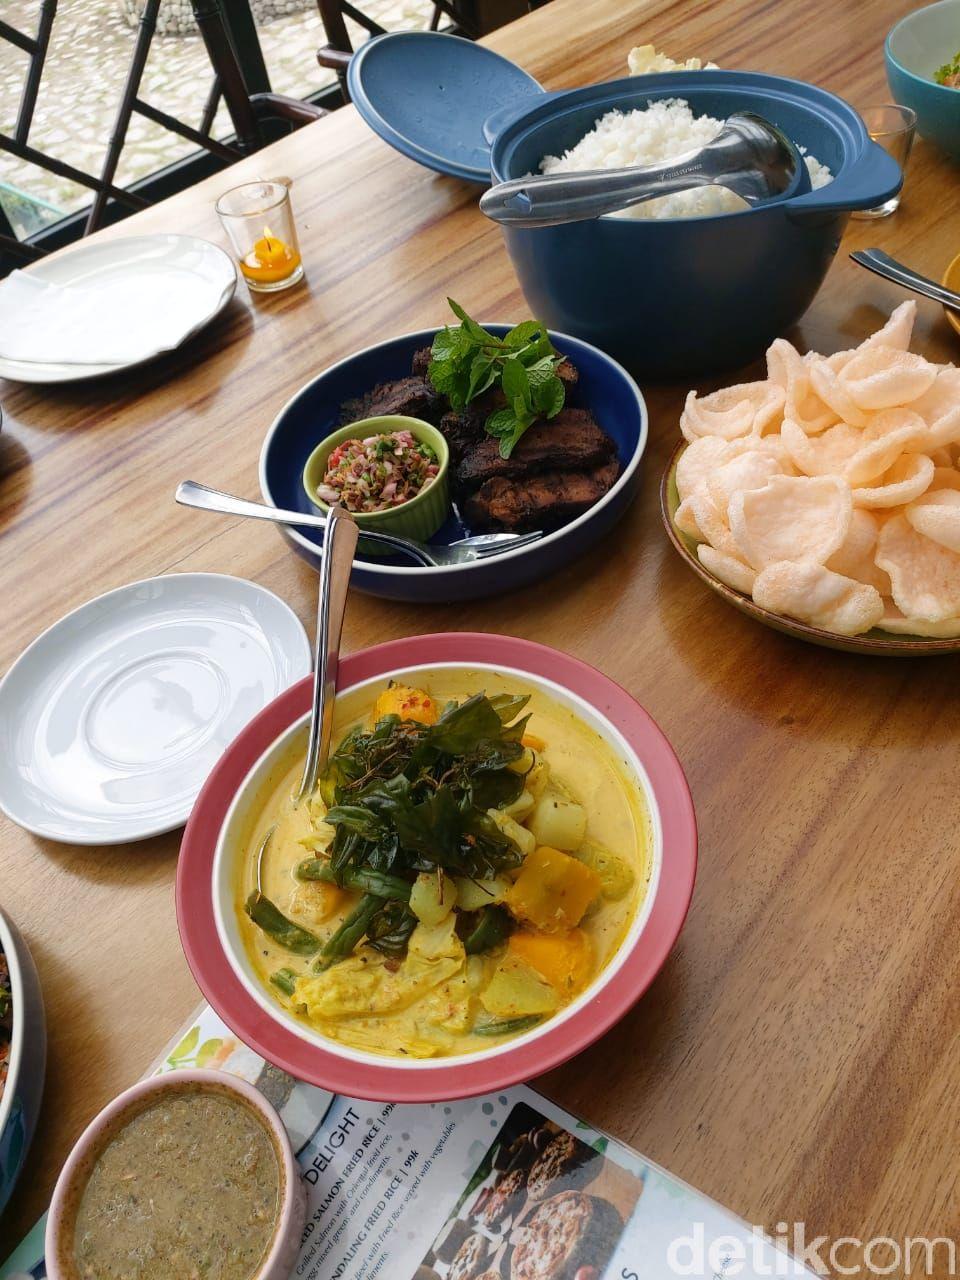 Gundaling Farmstead. Agrowisata terpadu dengan konsep farm to table menyajikan menu khas Karo dan menu internasional dengan bahan baku dari peternakan yang langsung disajikan segar di restoran yang berlokasi tidak jauh dari peternakan